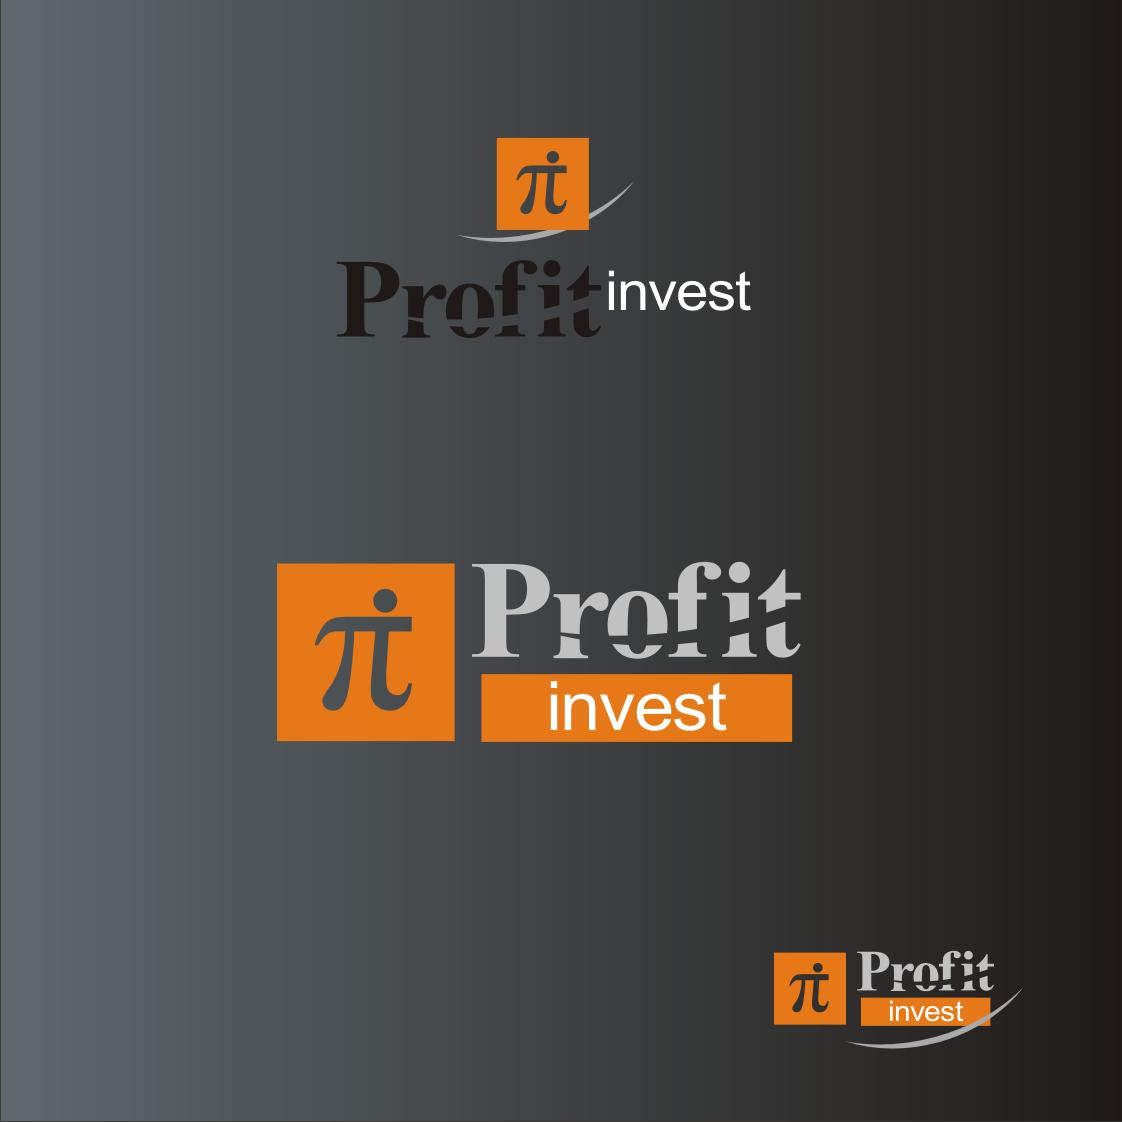 Разработка логотипа для брокерской компании фото f_4f15863ab6f8a.jpg